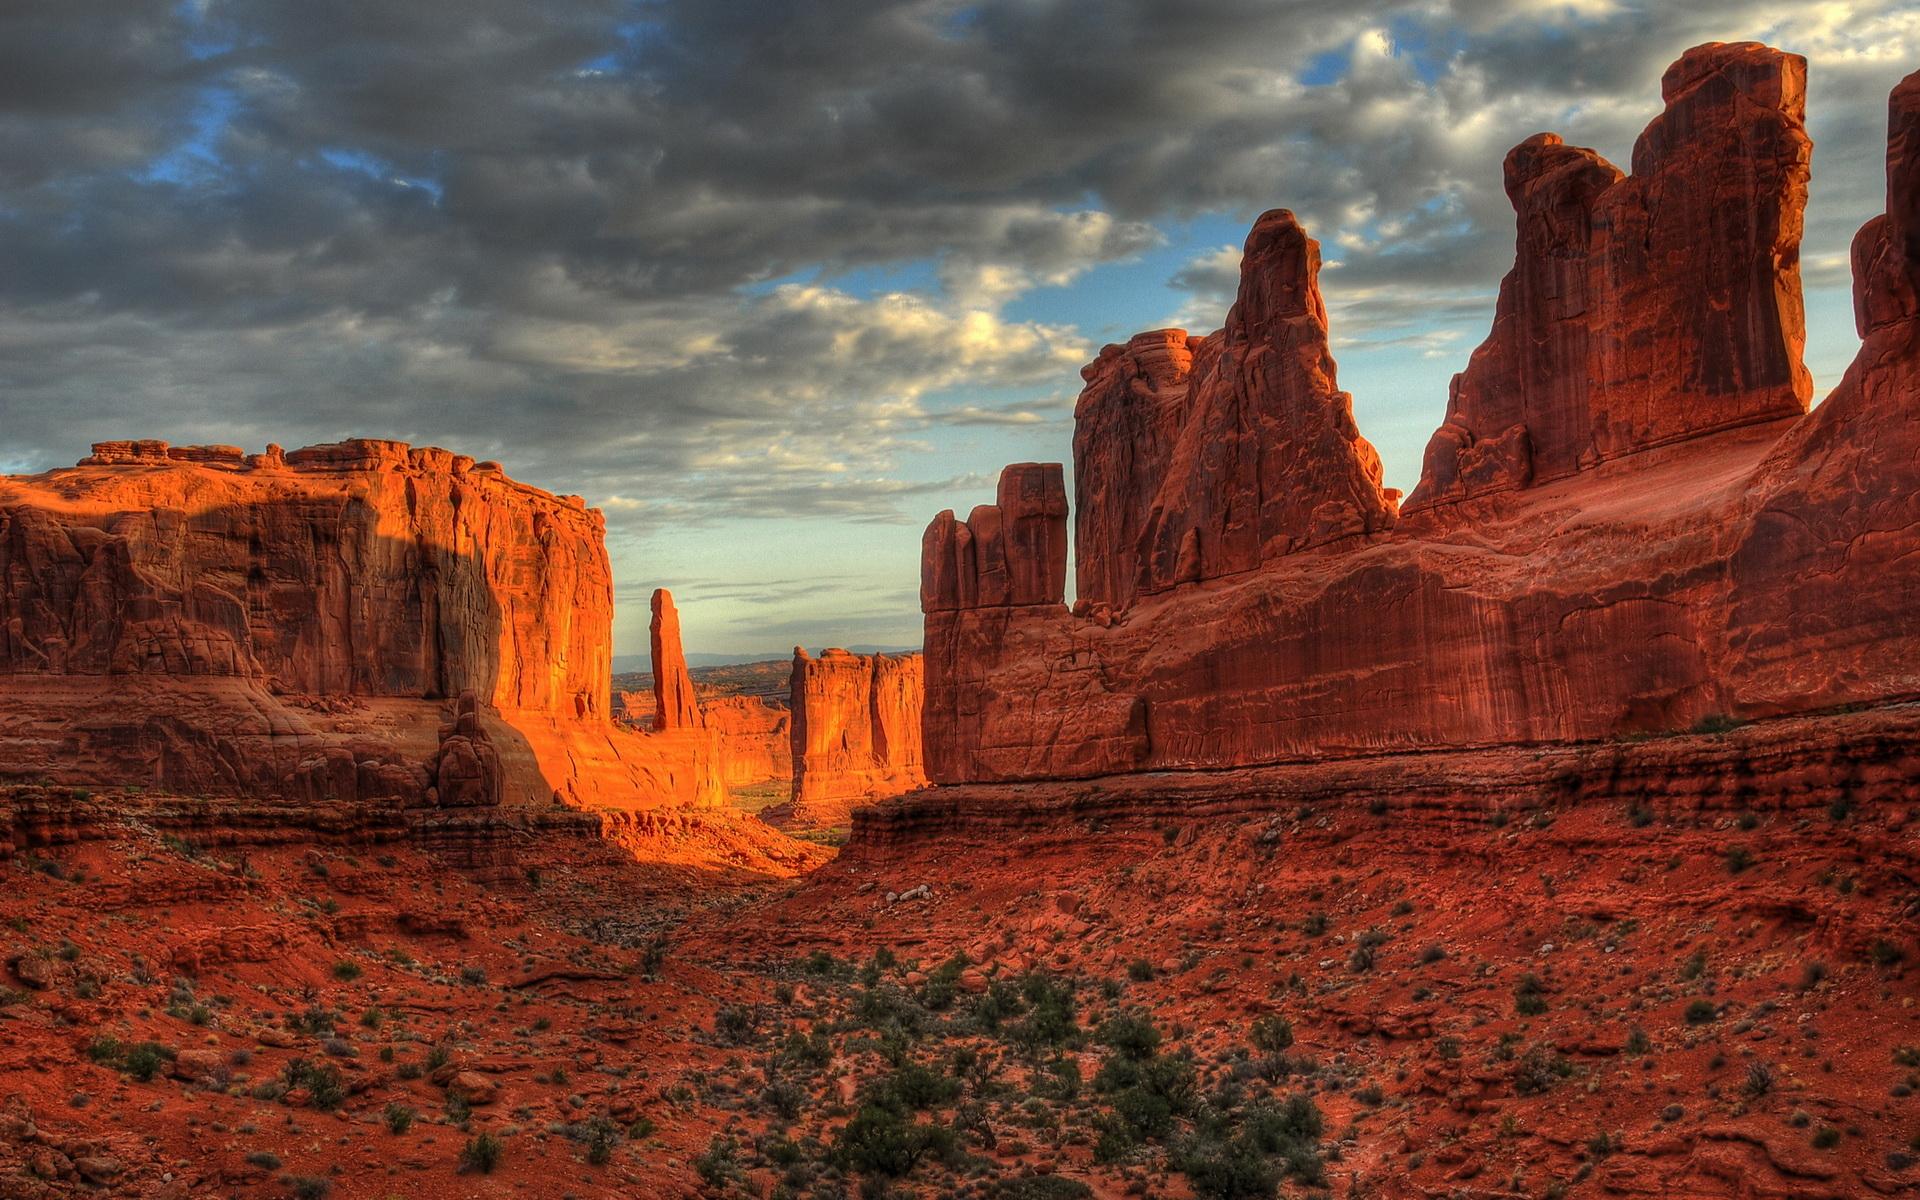 солнце каньон песок the sun canyon sand  № 2562927 бесплатно